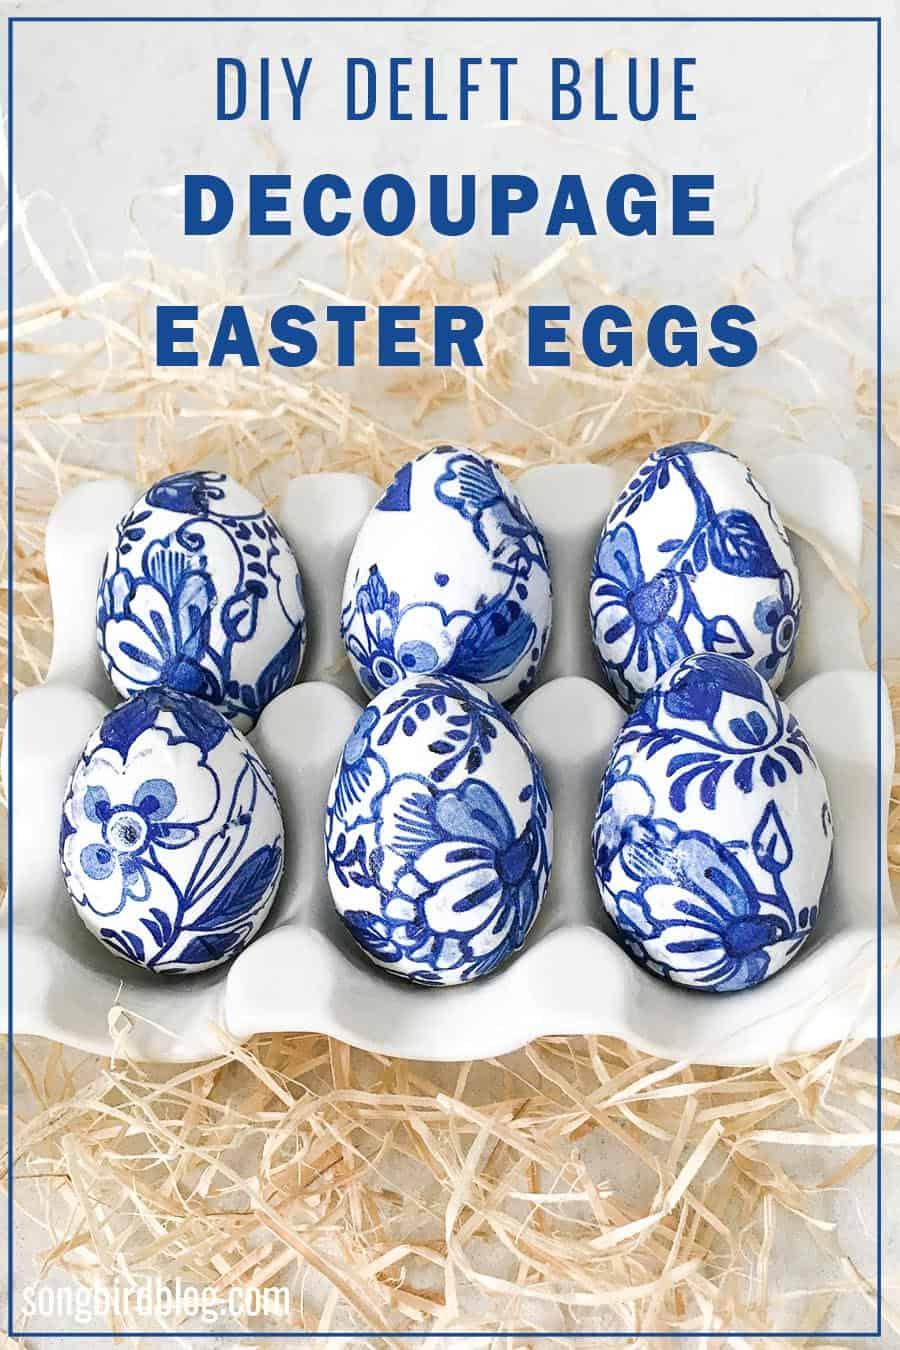 DIY Decoupage Tissue Paper Easter Eggs Tutorial